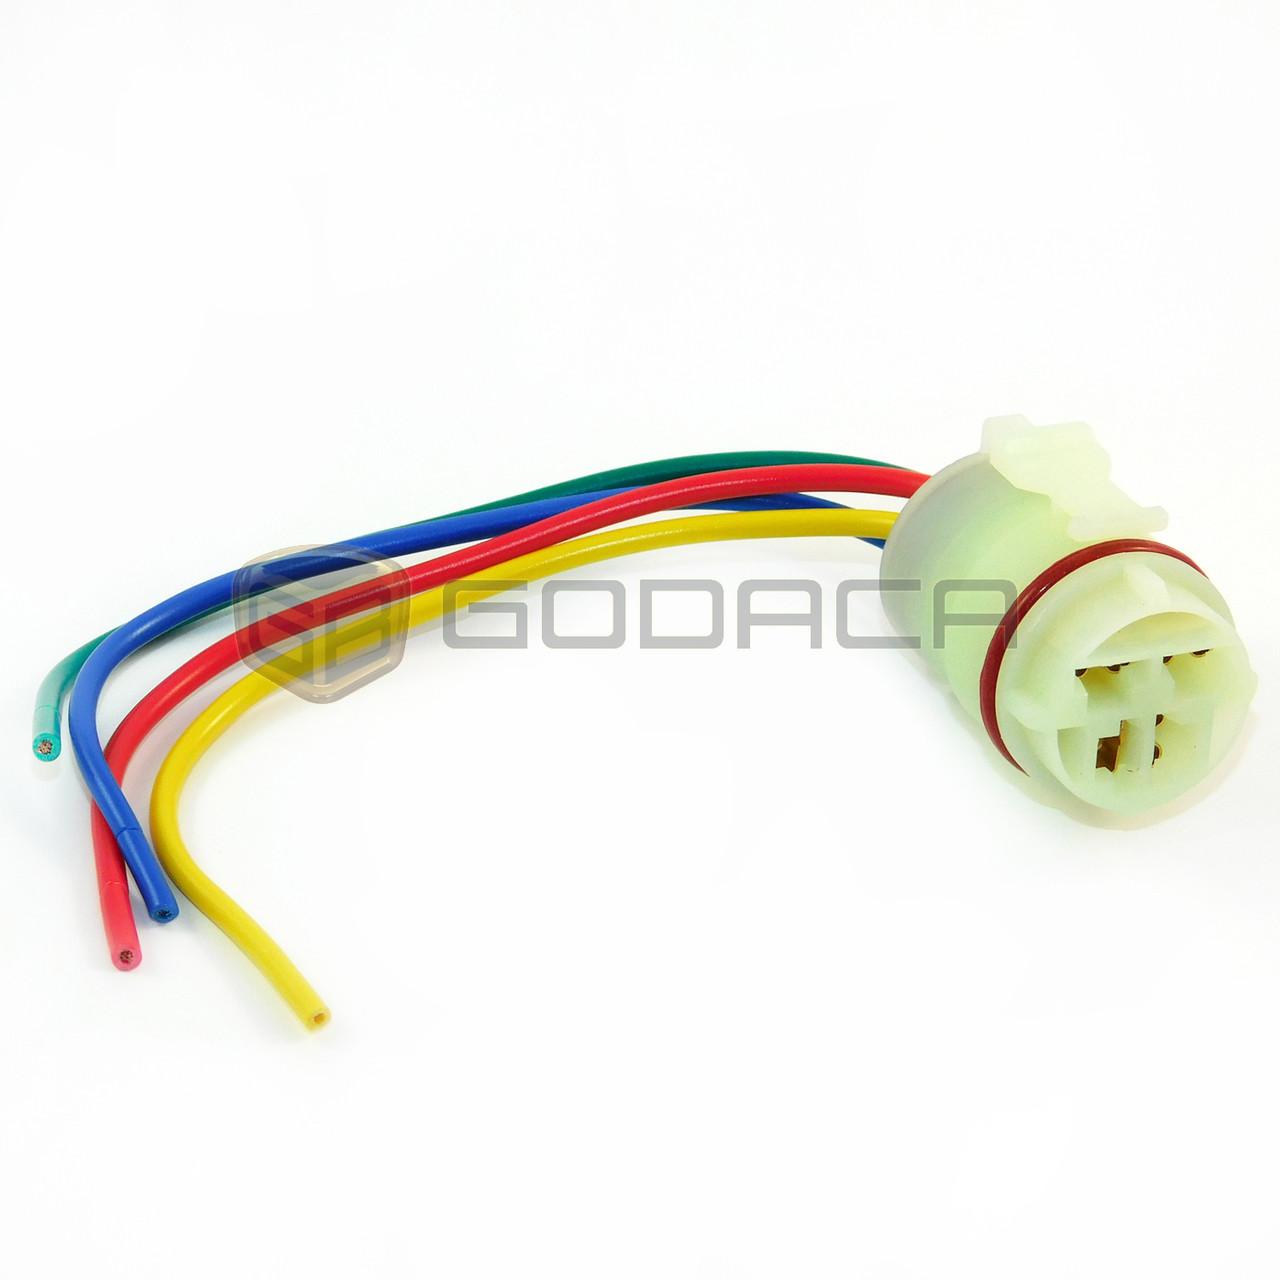 medium resolution of 1 x 4 way connector alternator repair plug harness universal for gm gm wiring harness repair